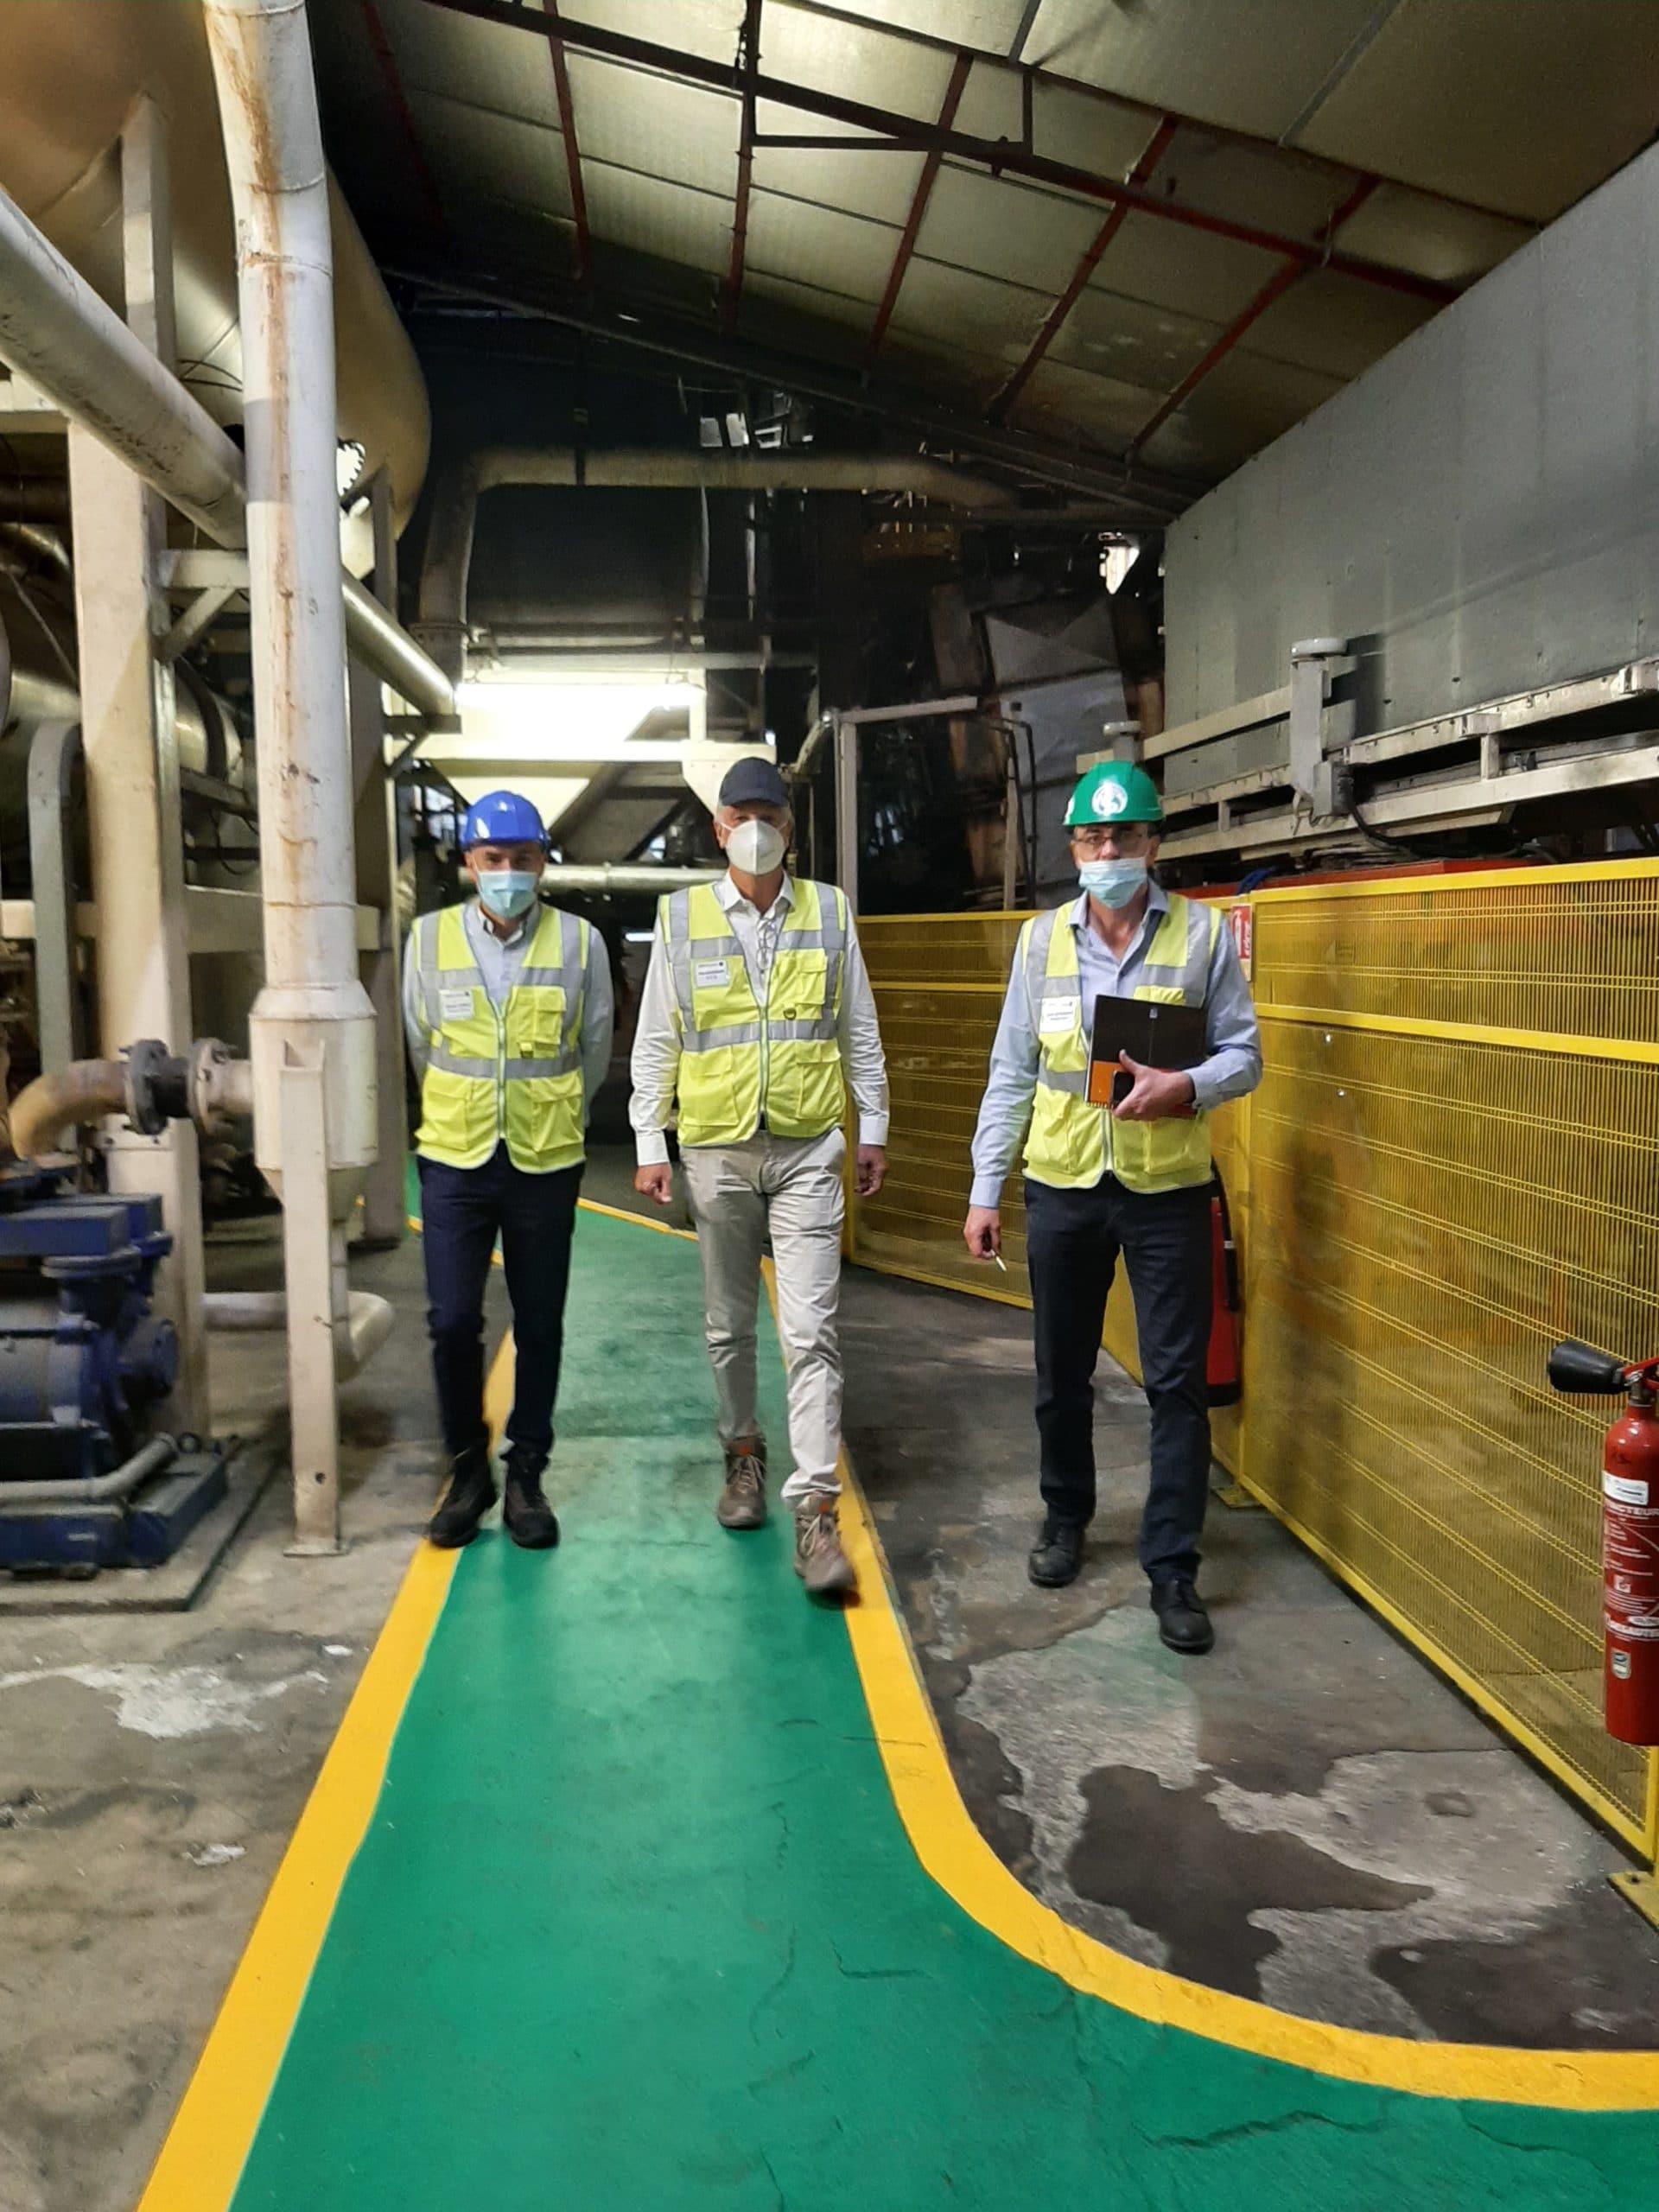 fabrication polystyrene expanse recyclage usine hirsch isolation